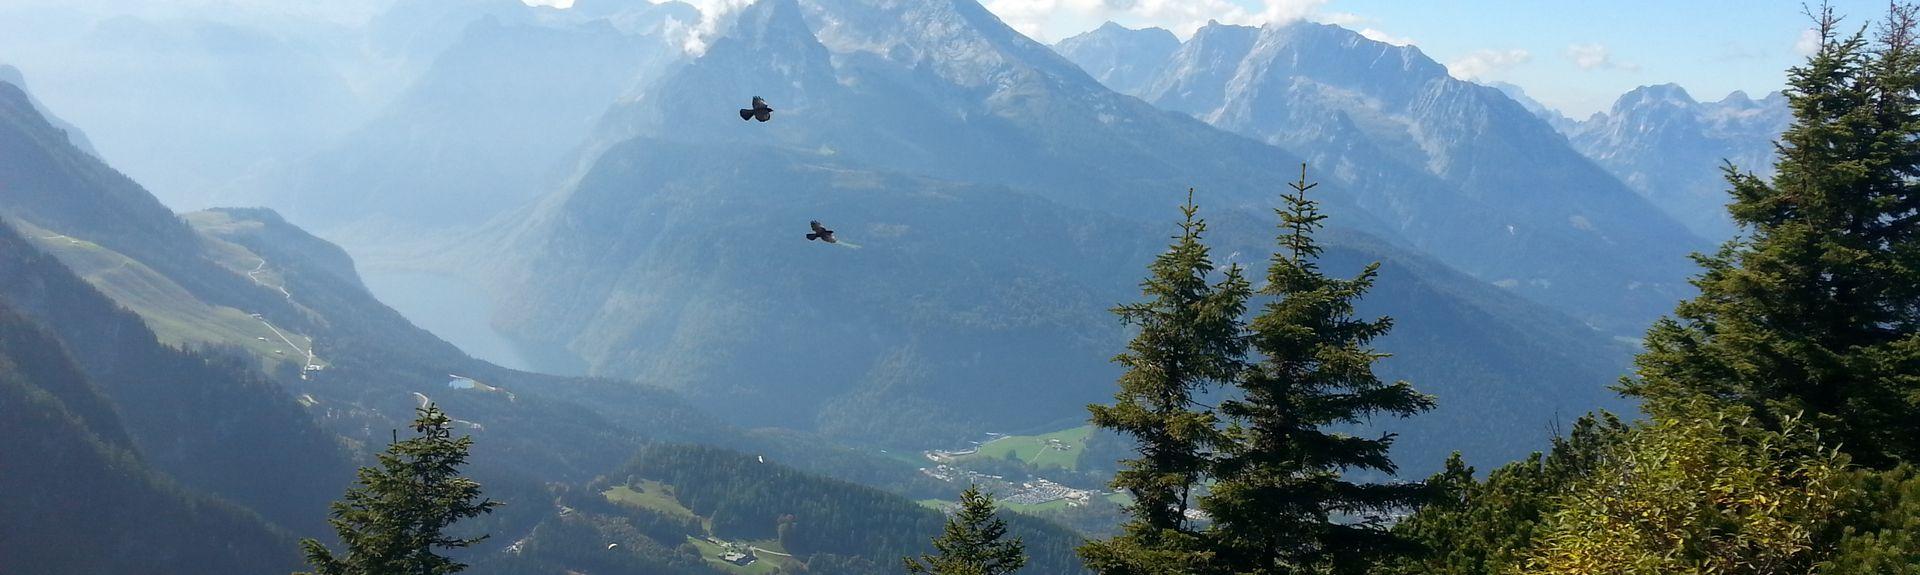 Winkl, Bischofswiesen, Bavaria, Germany